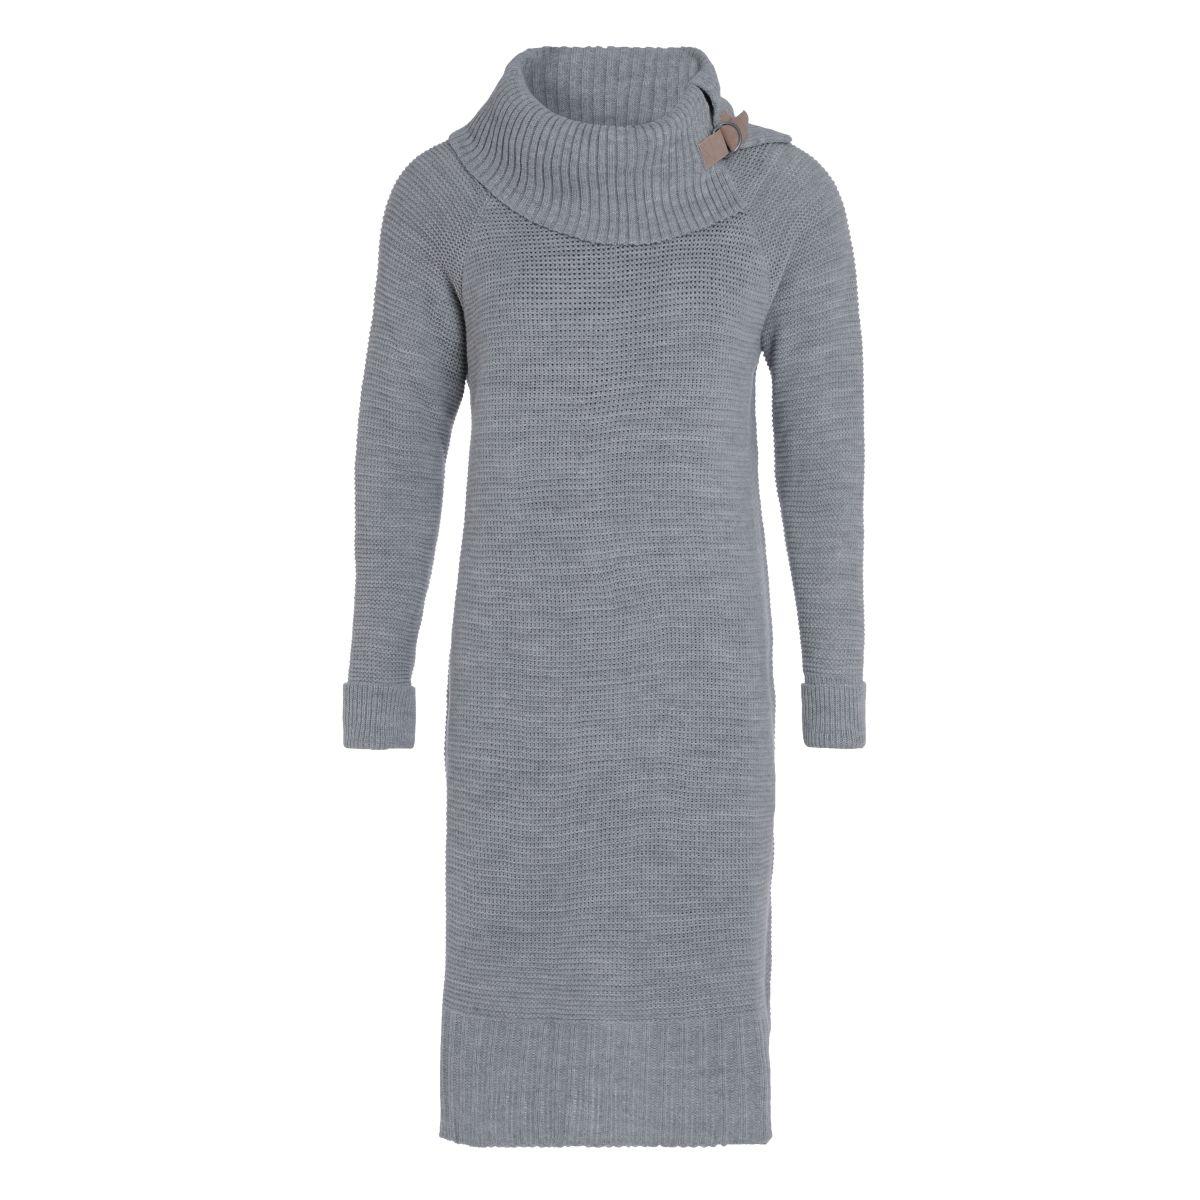 jamie knitted dress light grey 3638